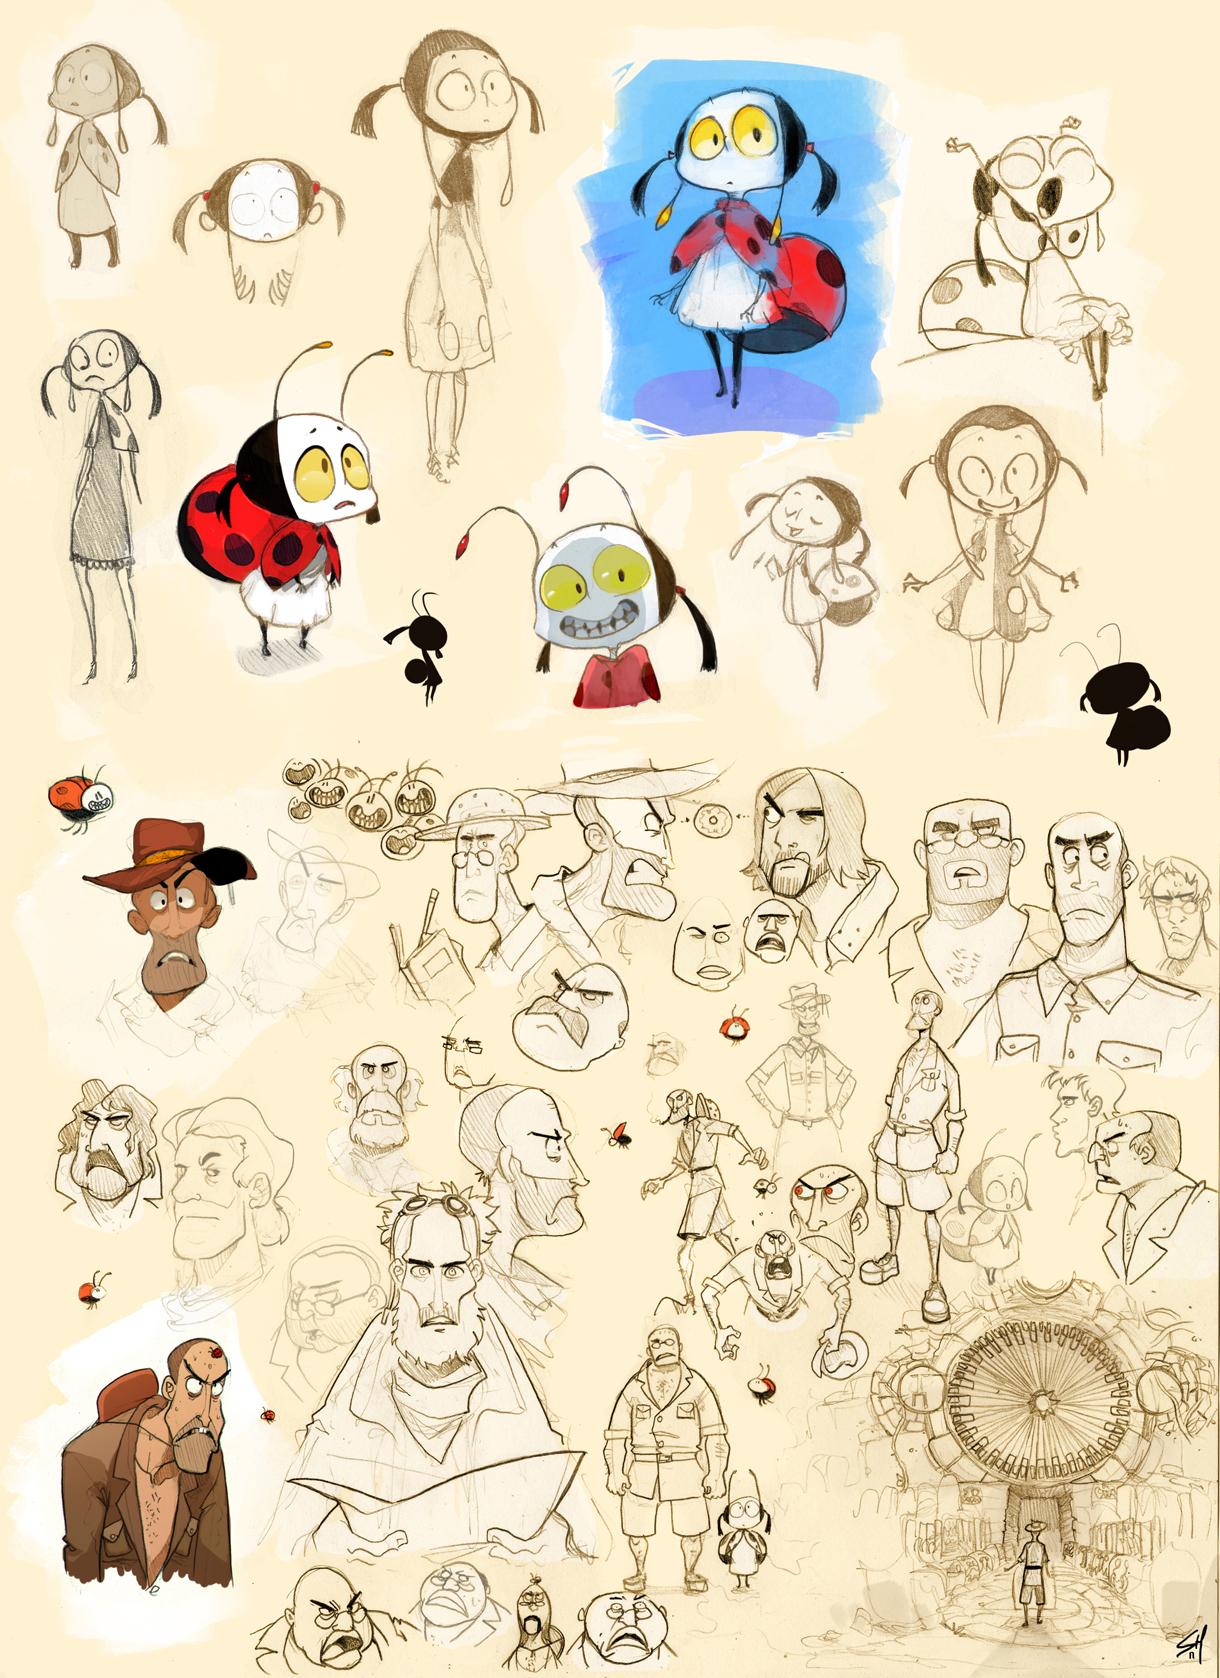 Ladybug and Explorer. by Endling